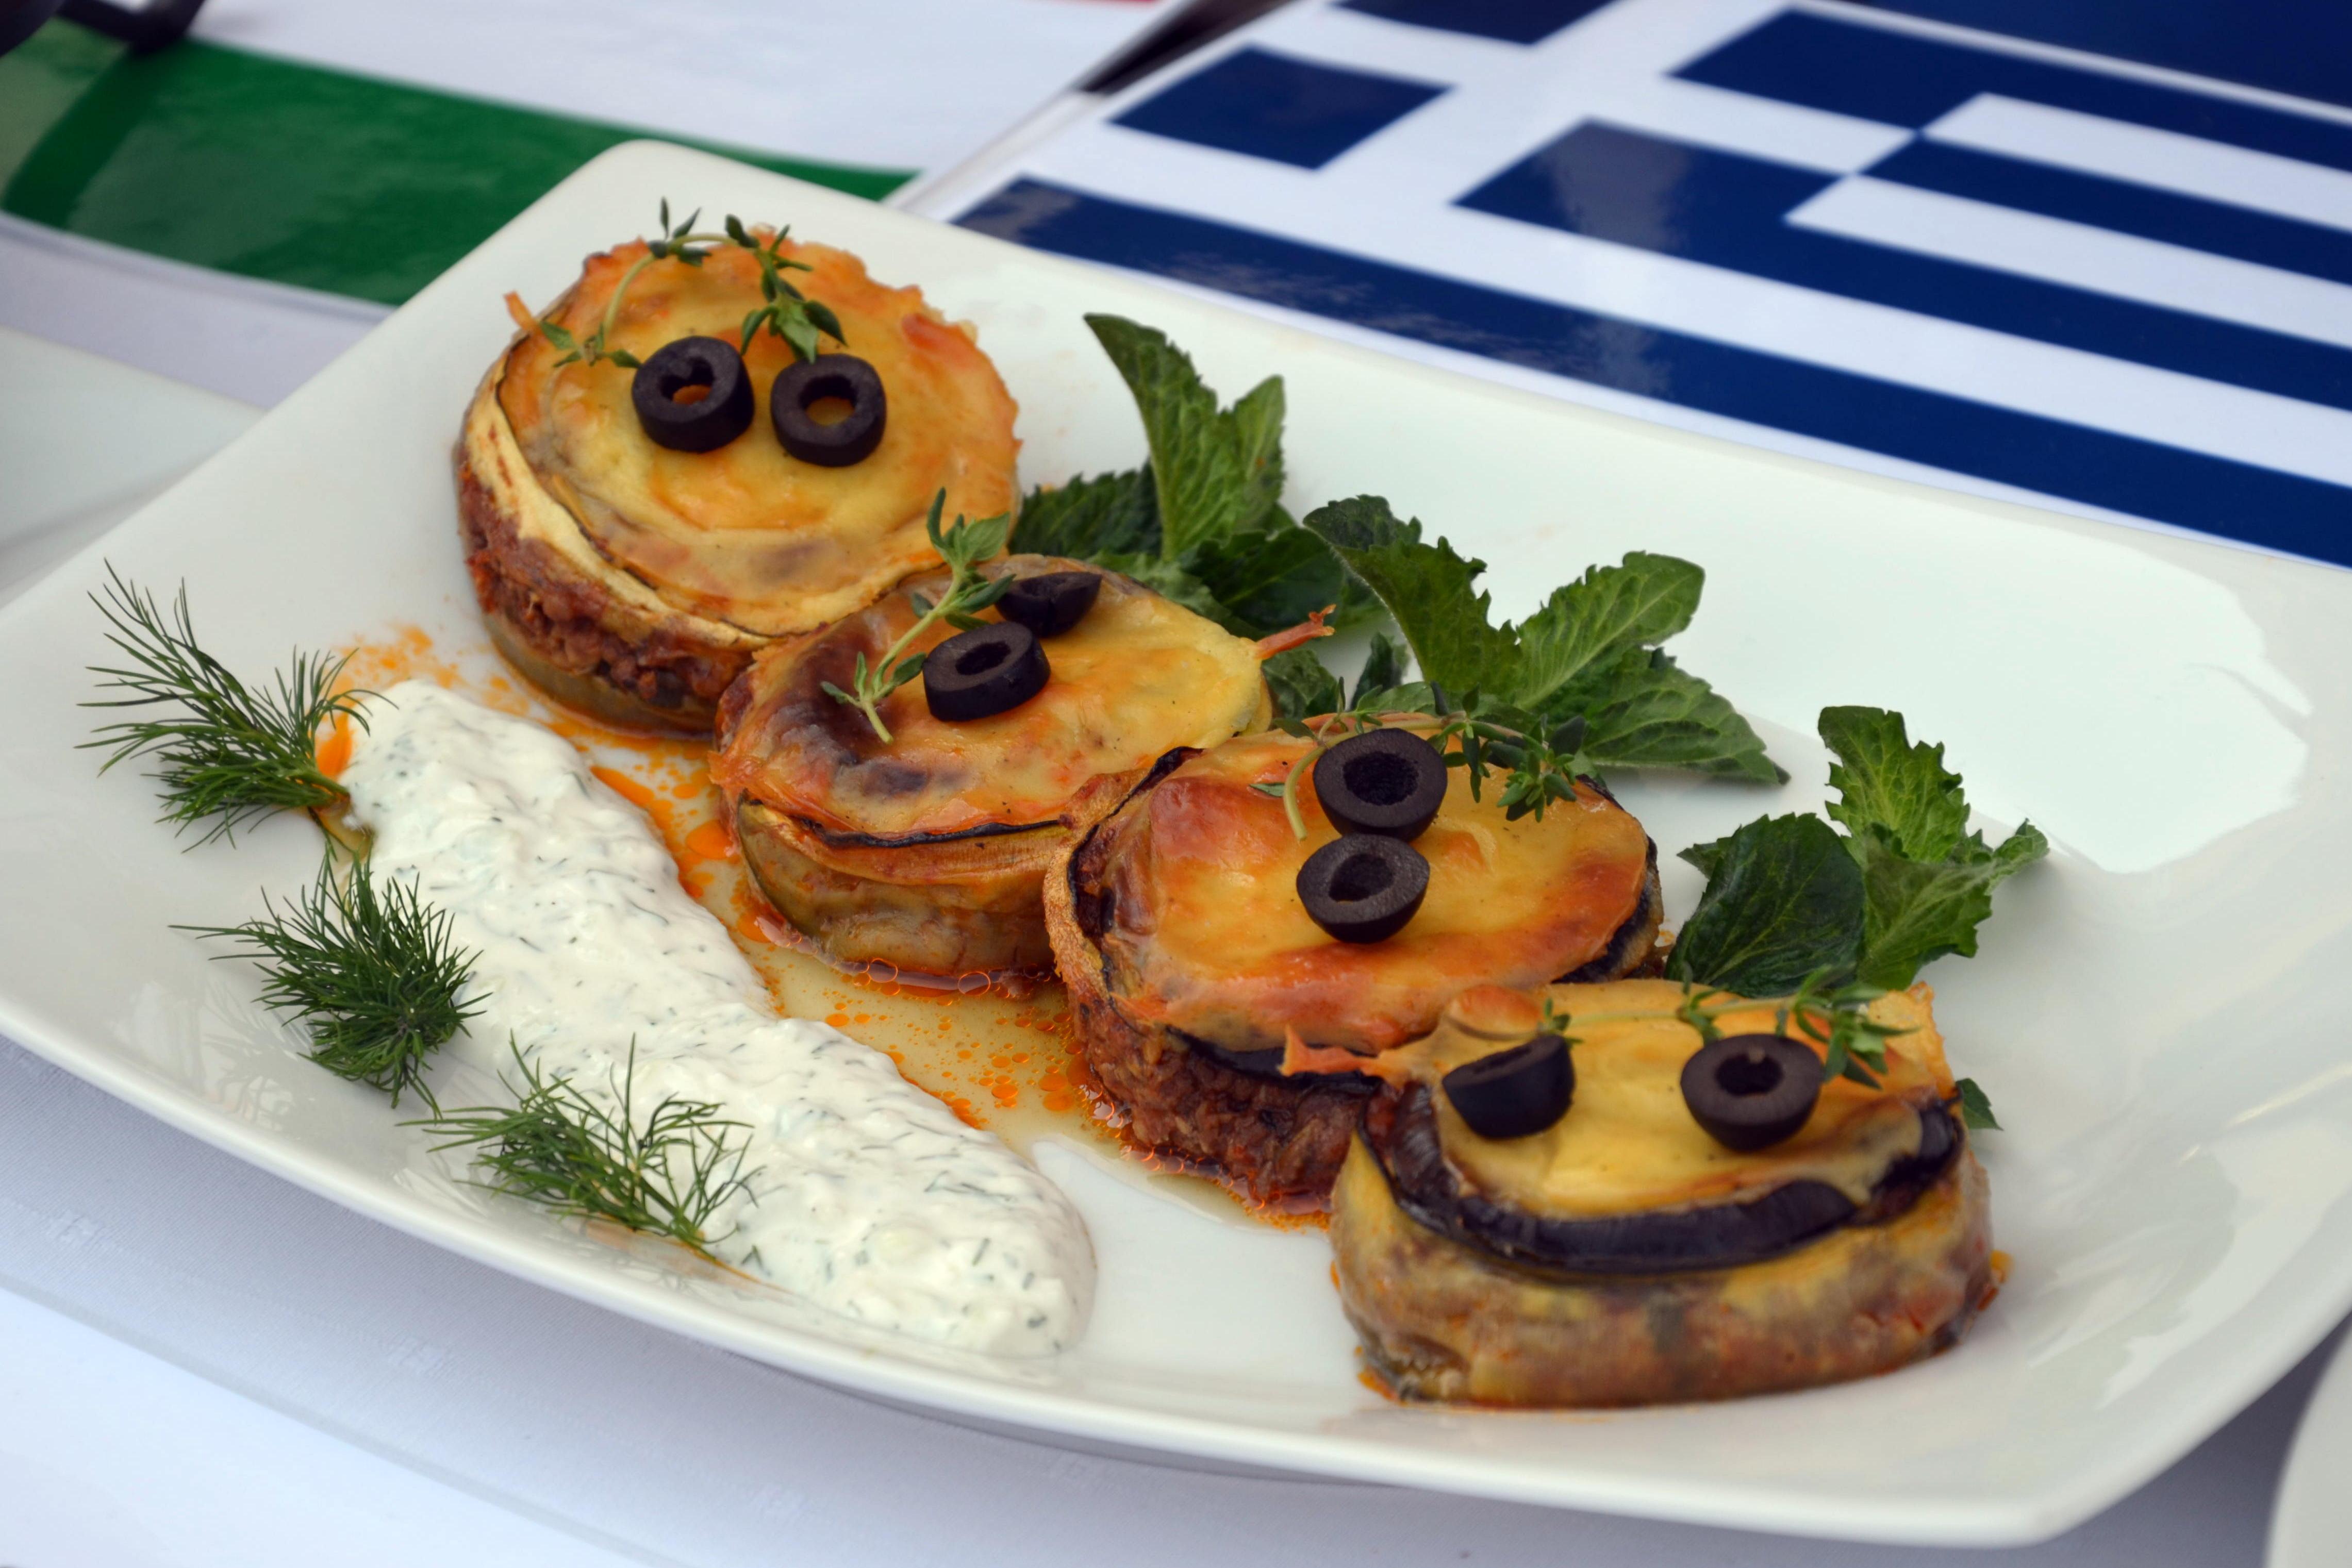 File:02014 Griechische Küche in Rzeszów.jpg - Wikimedia Commons